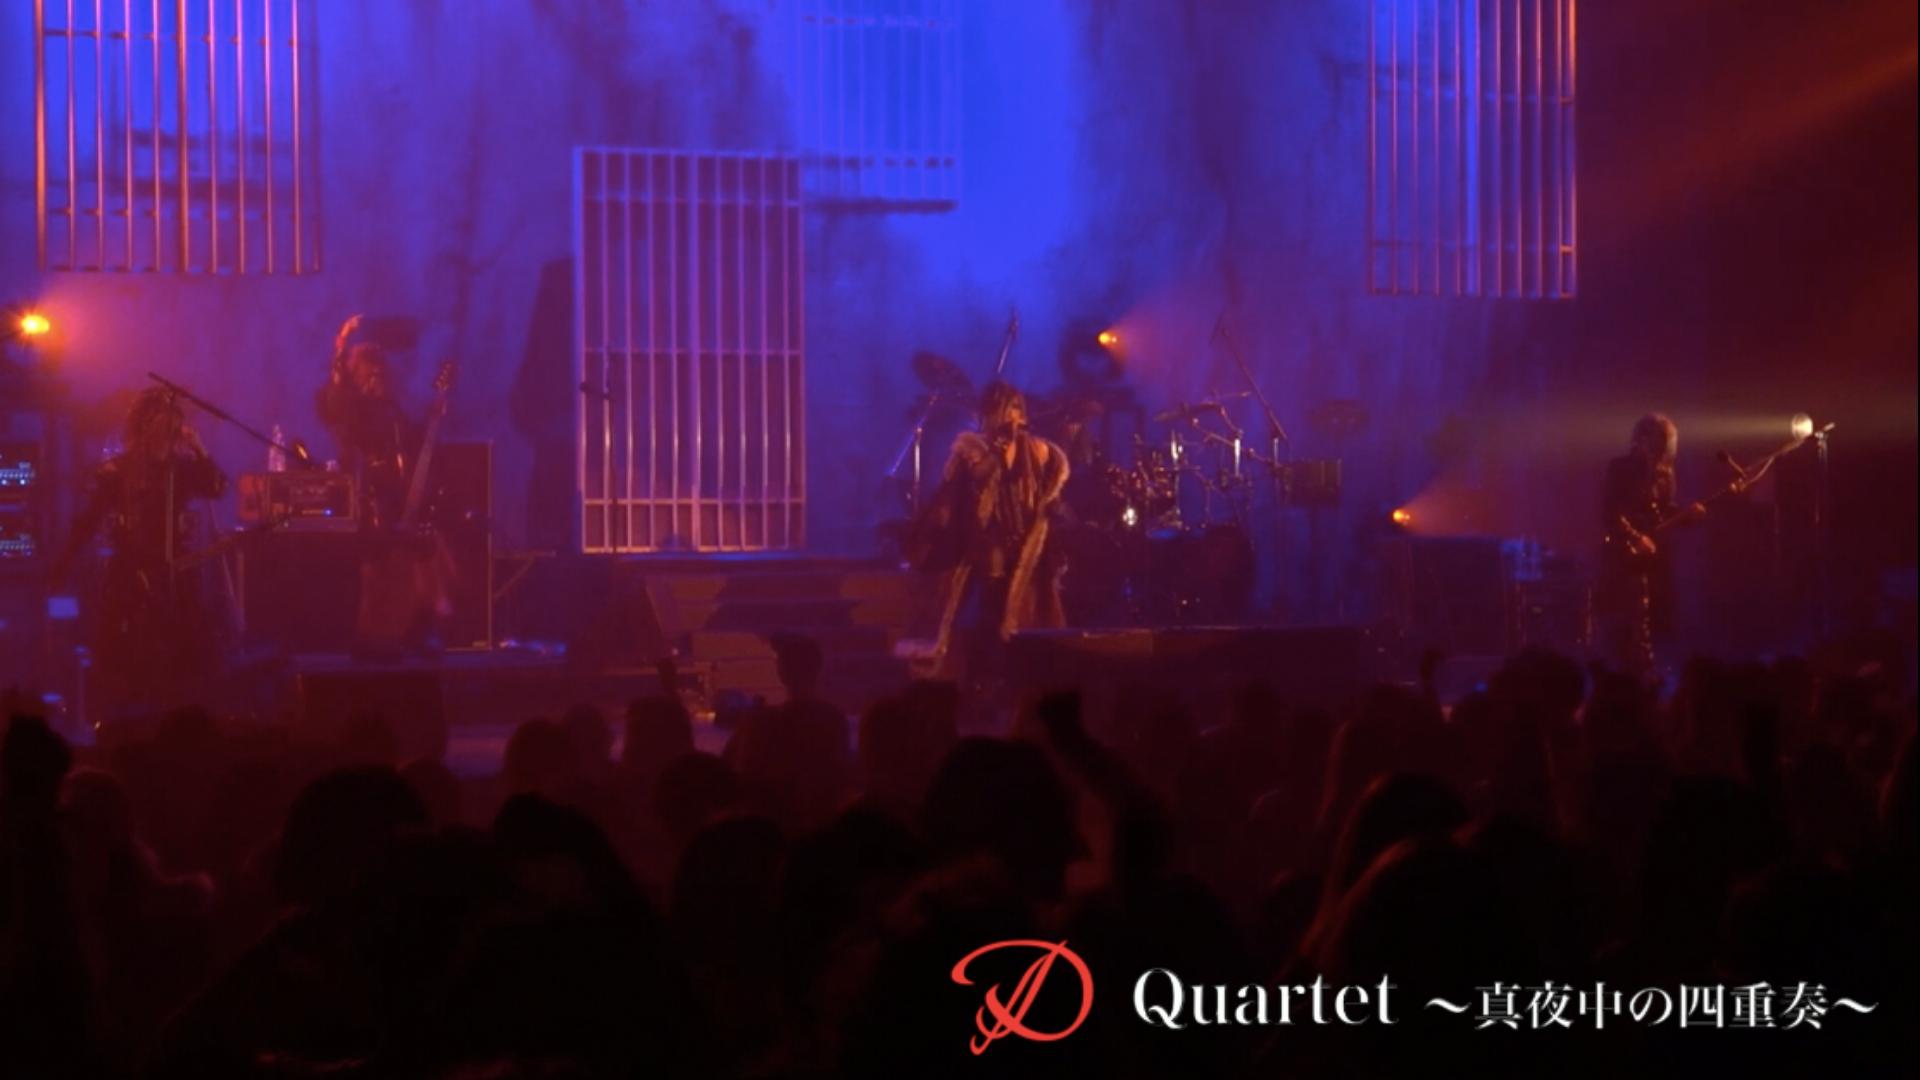 Quartet ~真夜中の四重奏~